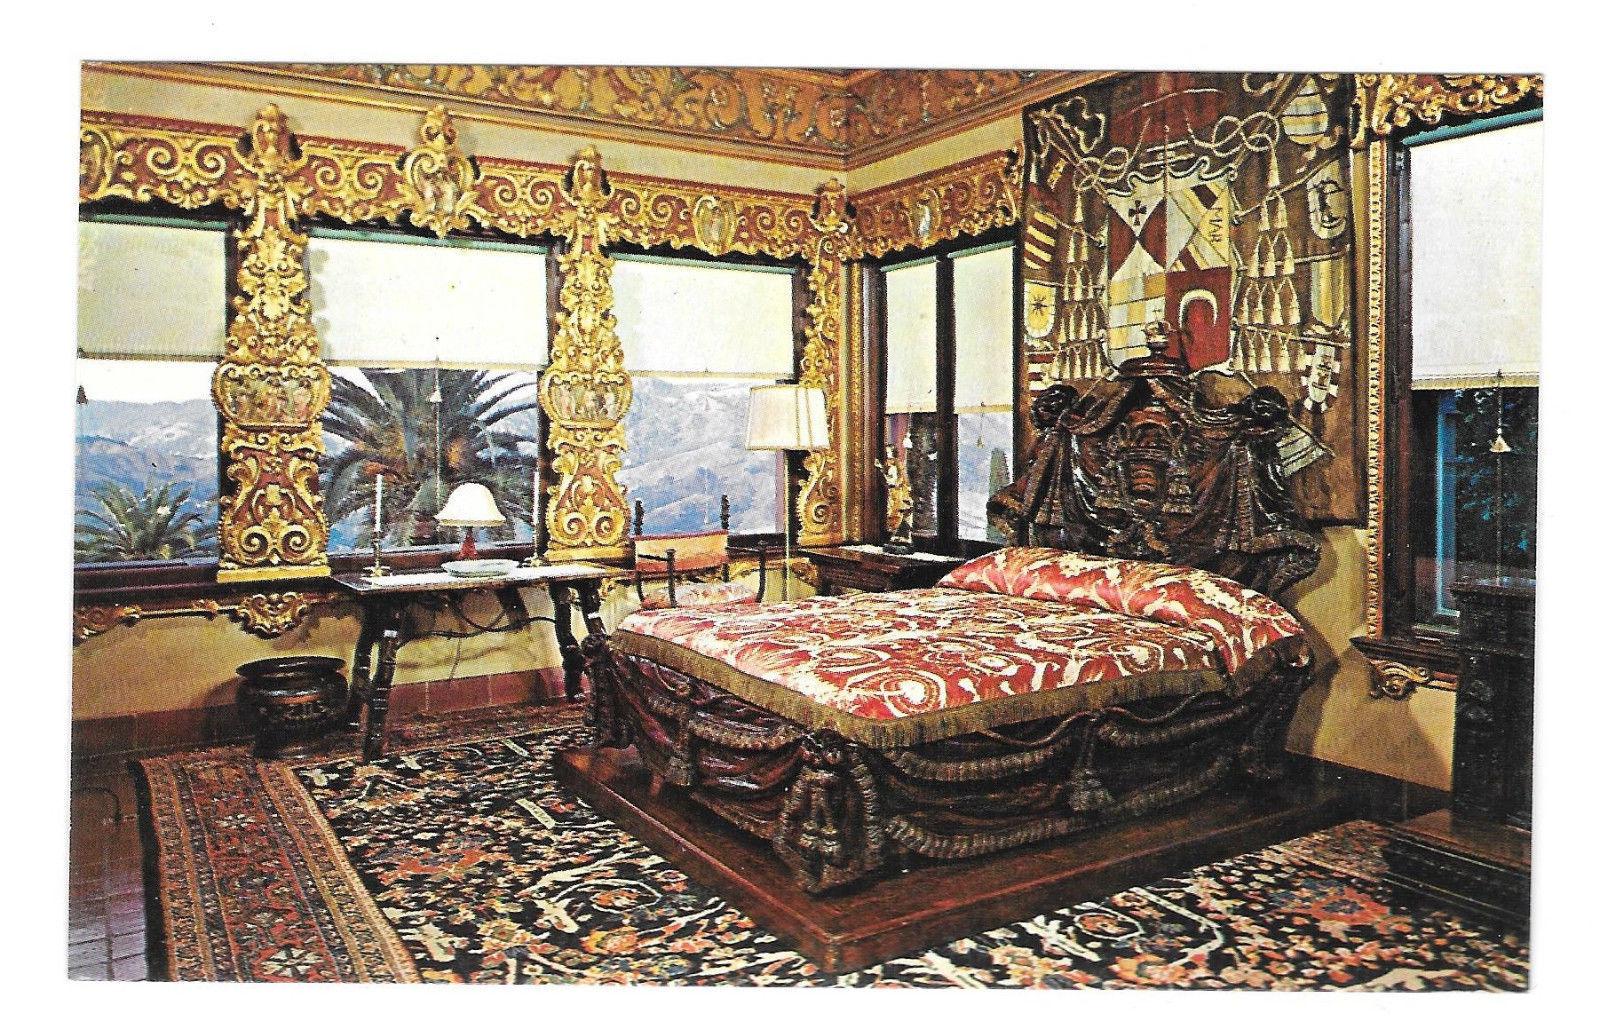 CA San Simeon Hearst Castle Mansion Cardinal Richelieu Bed Vtg Postcard